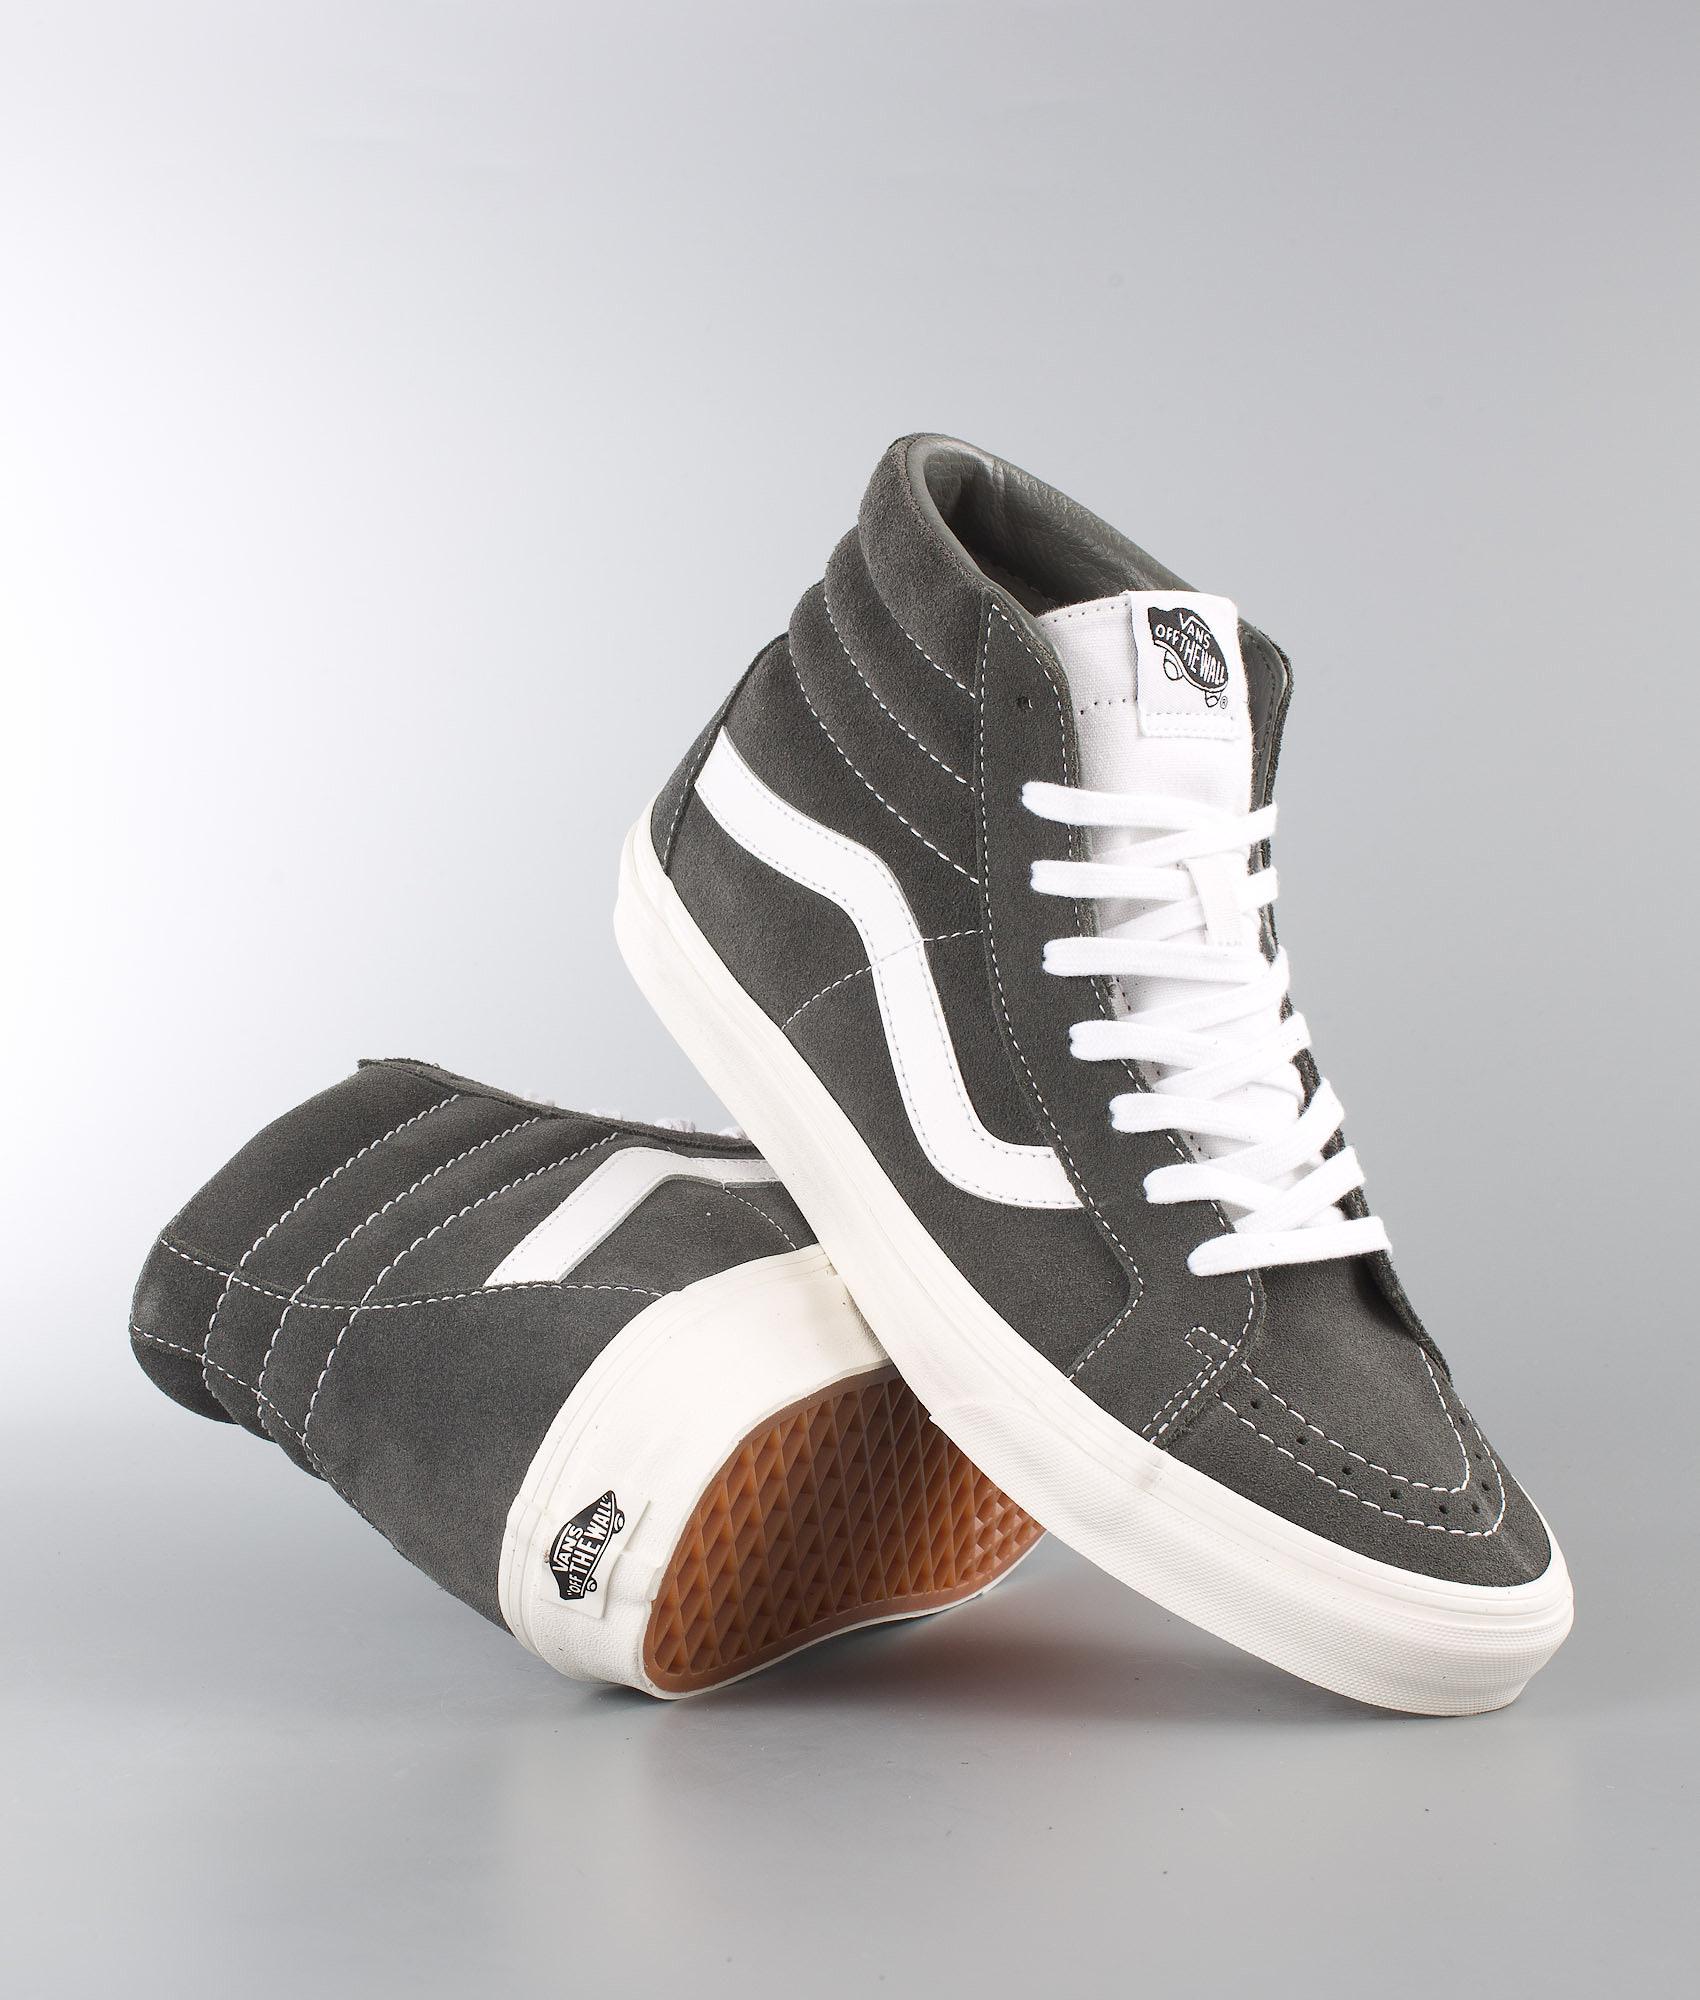 549bac29c3 Vans Sk8-Hi Reissue Shoes (Retro Sport) Gunmetal - Ridestore.com